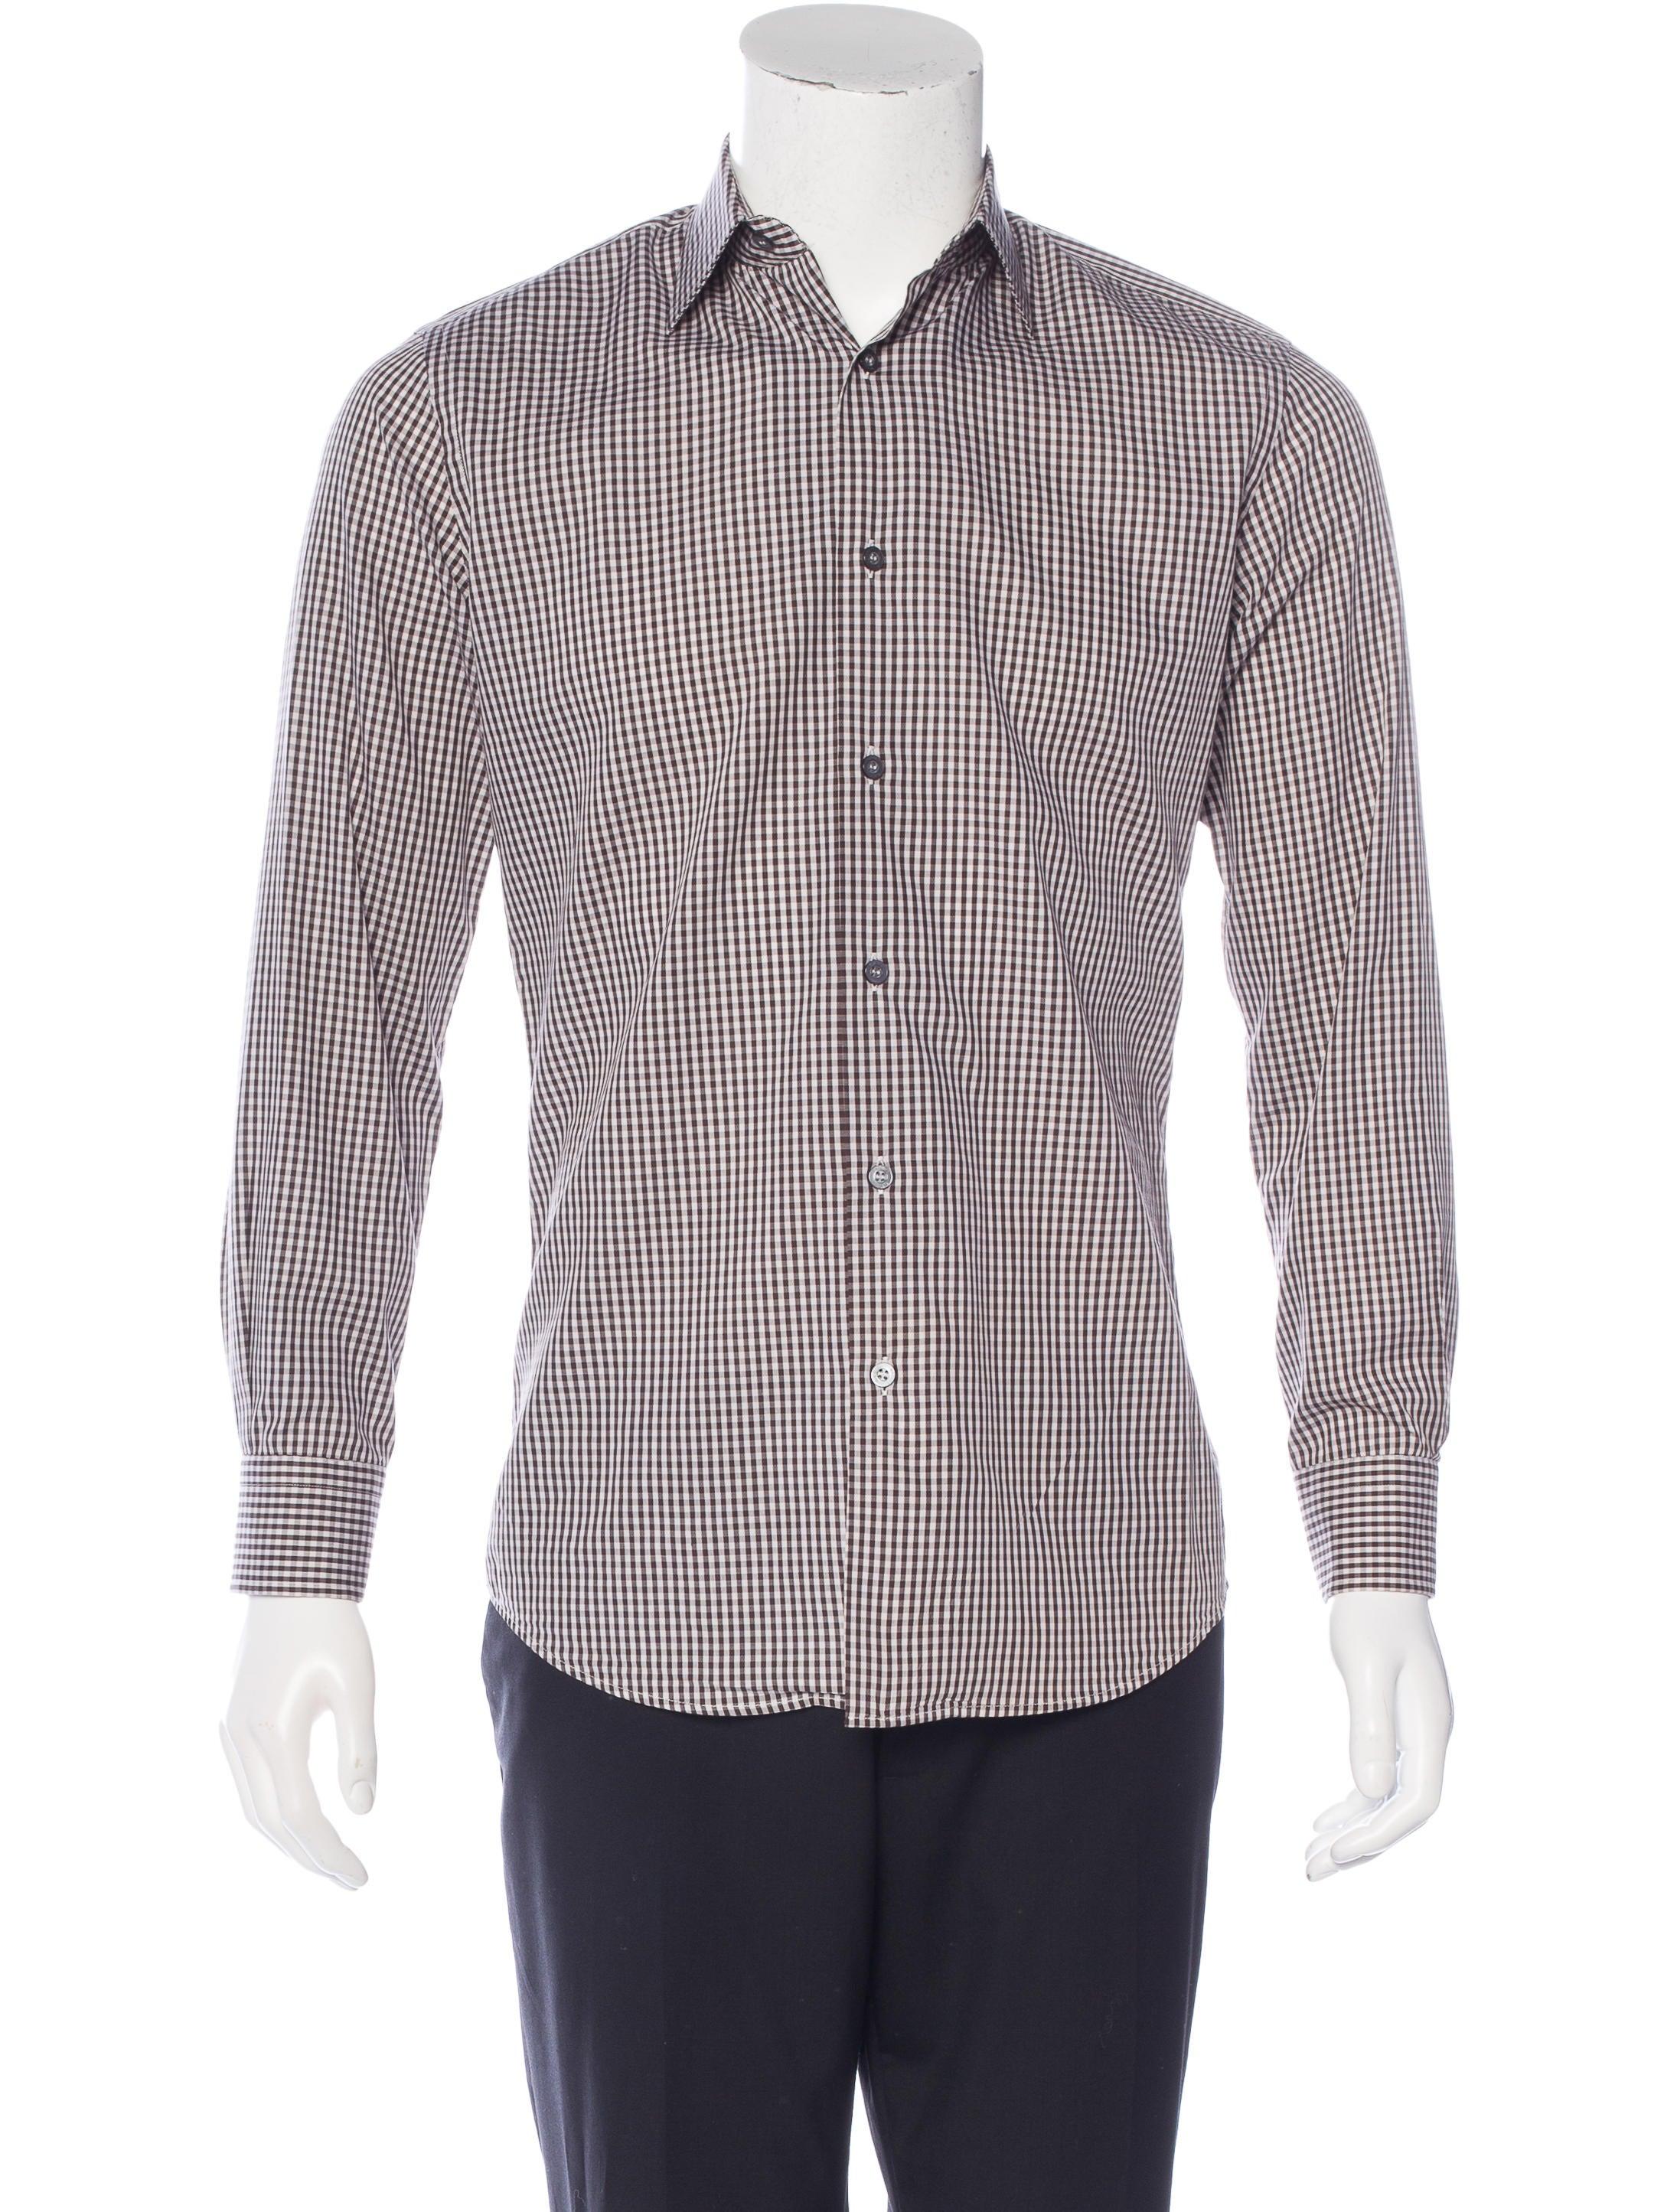 Paul smith gingham dress shirt clothing wps23386 the for Men s red gingham dress shirt